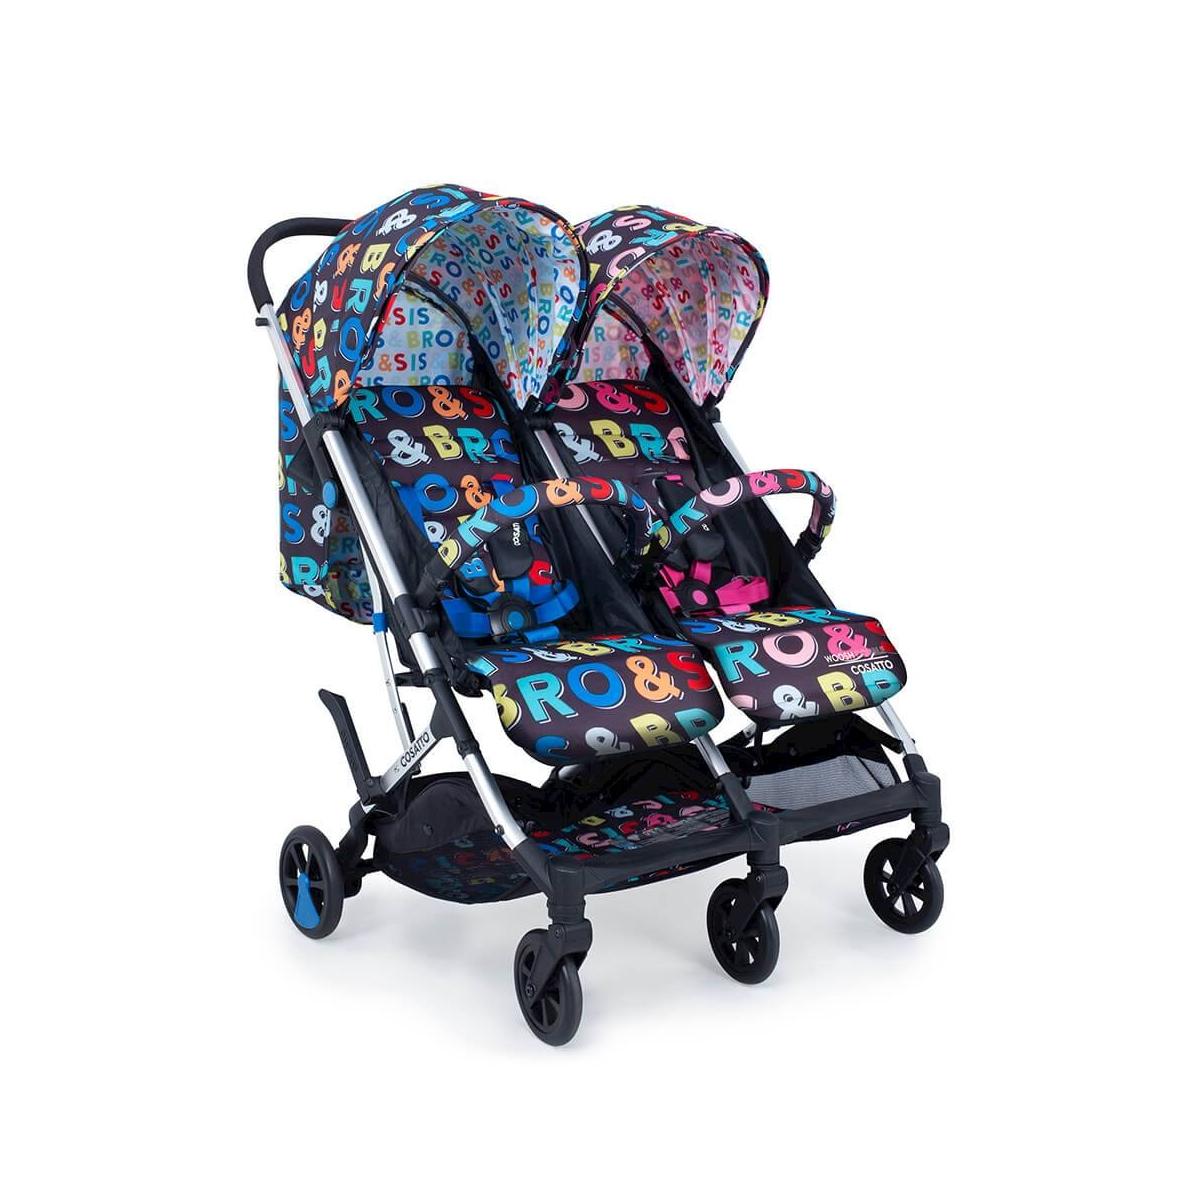 Cosatto Woosh Double Stroller-Sis & Bro (NEW)